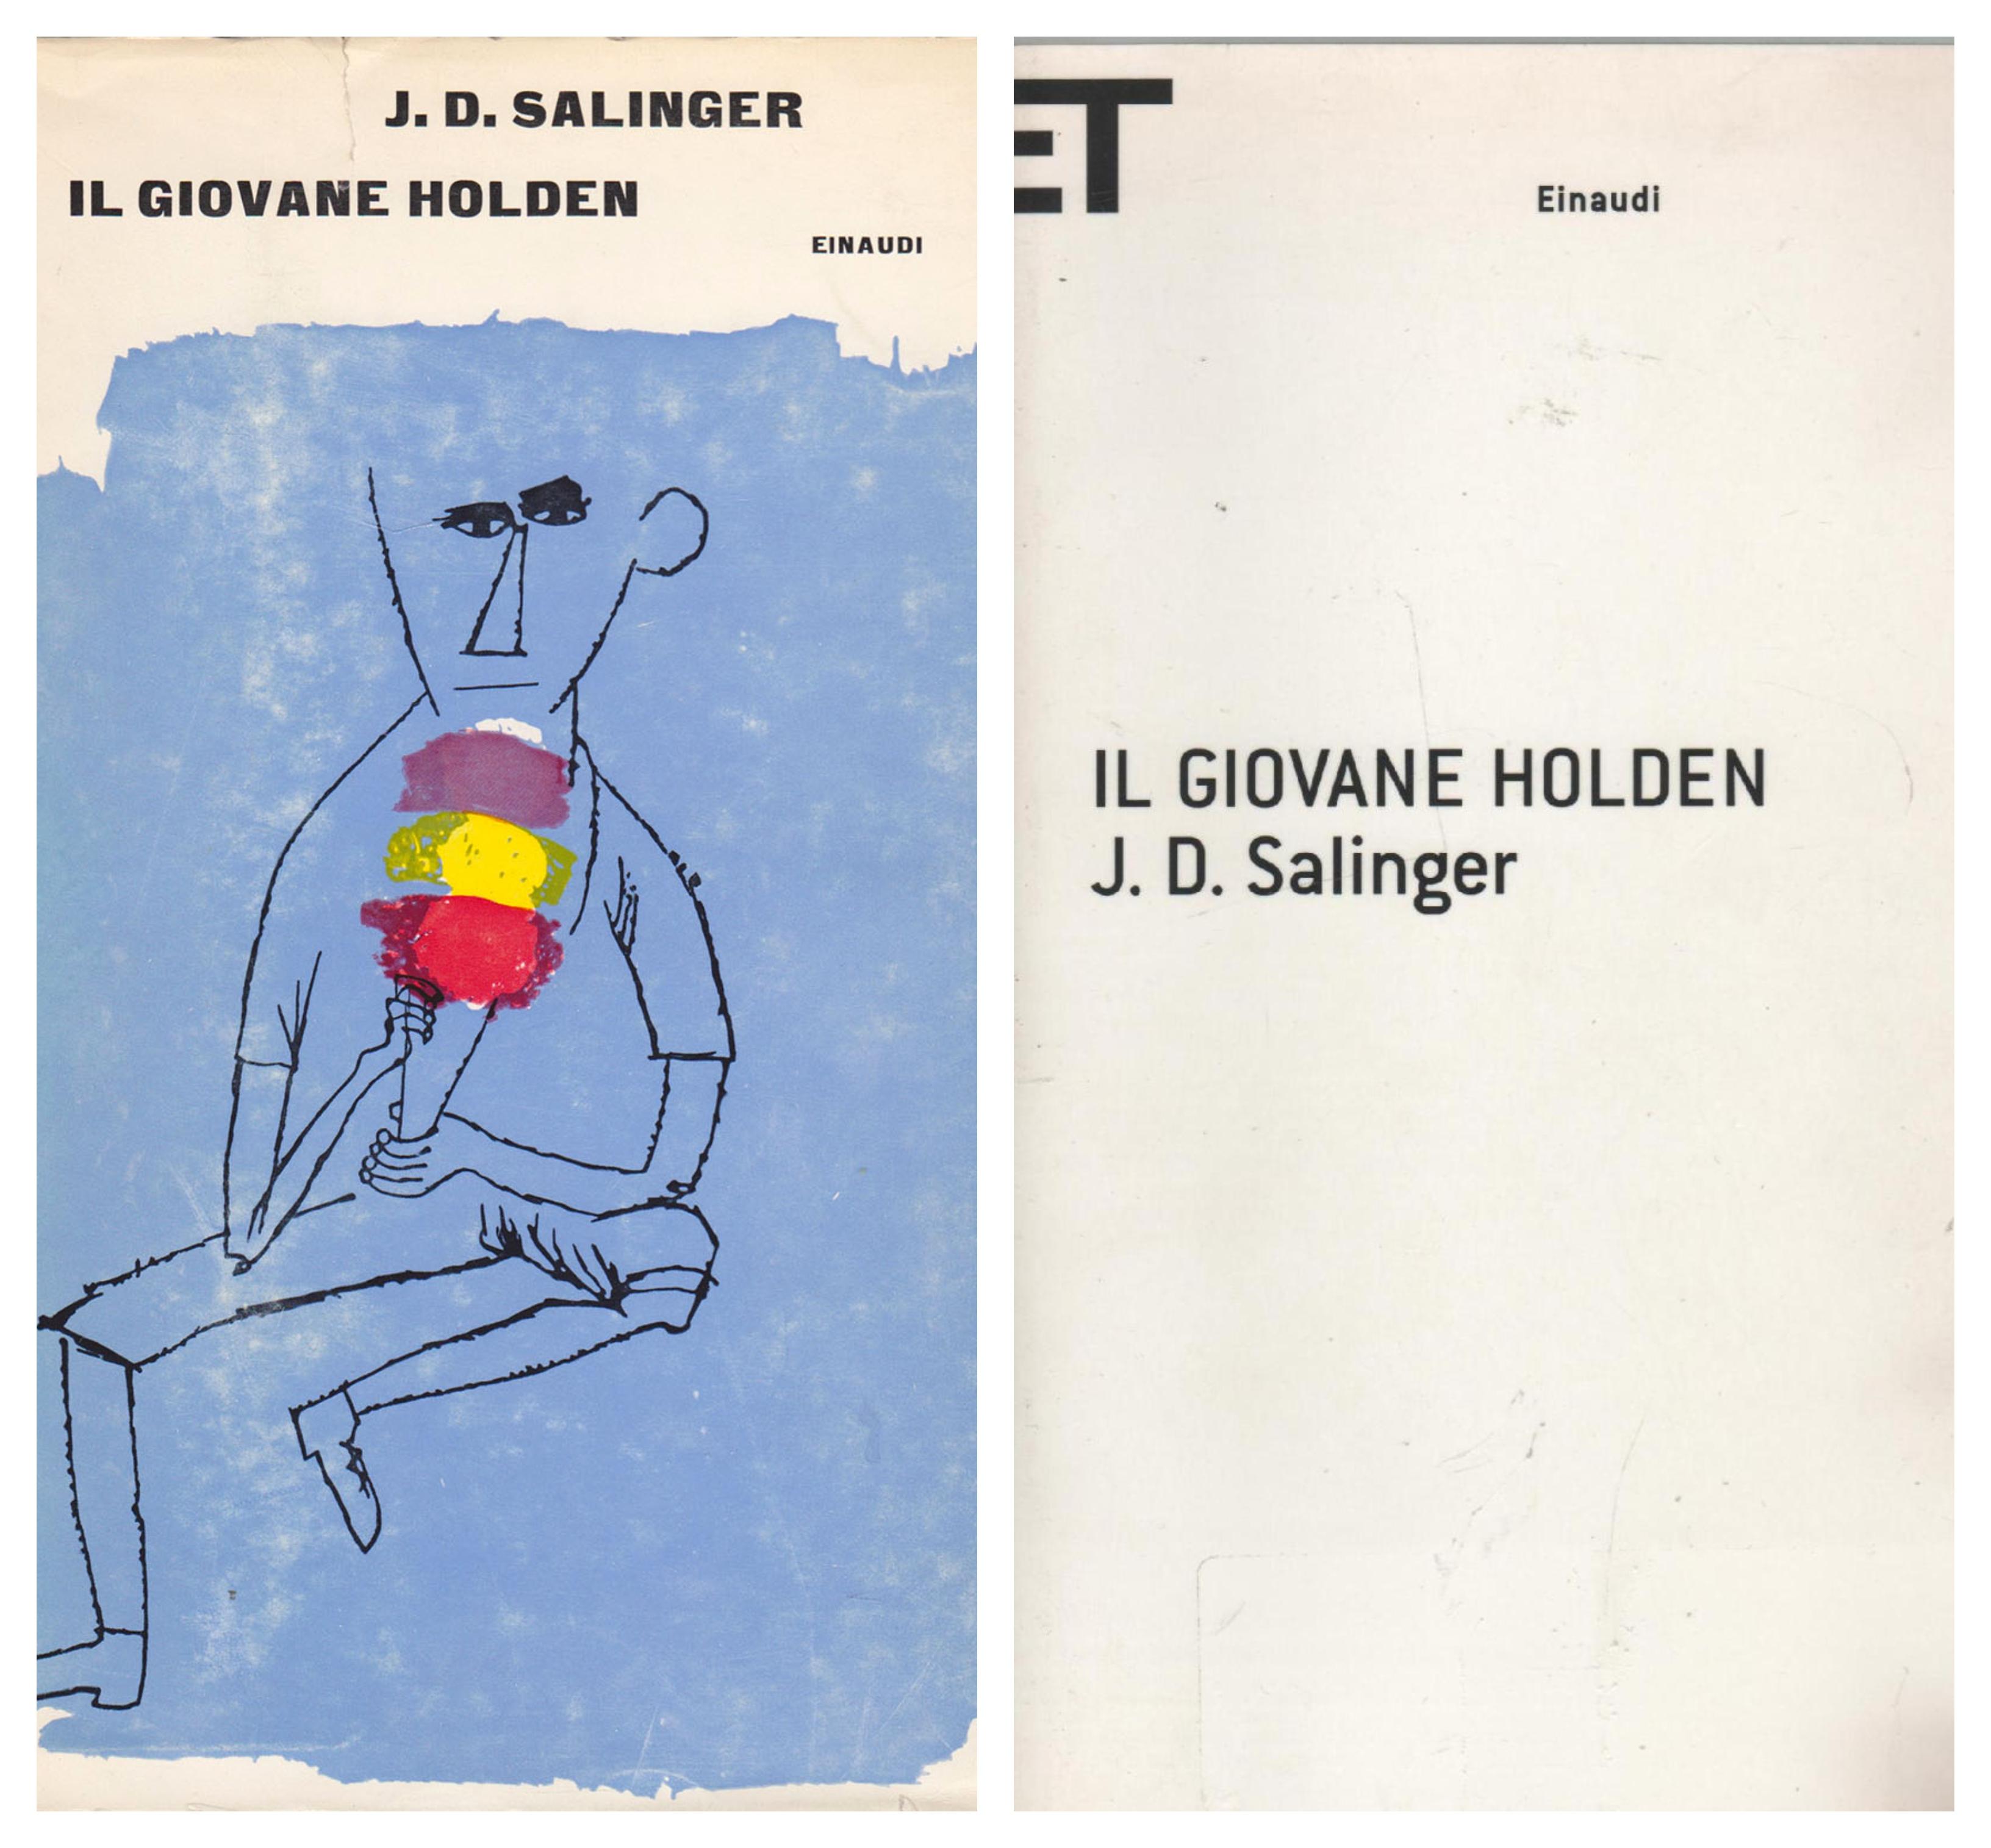 Ebook di J. D. Salinger